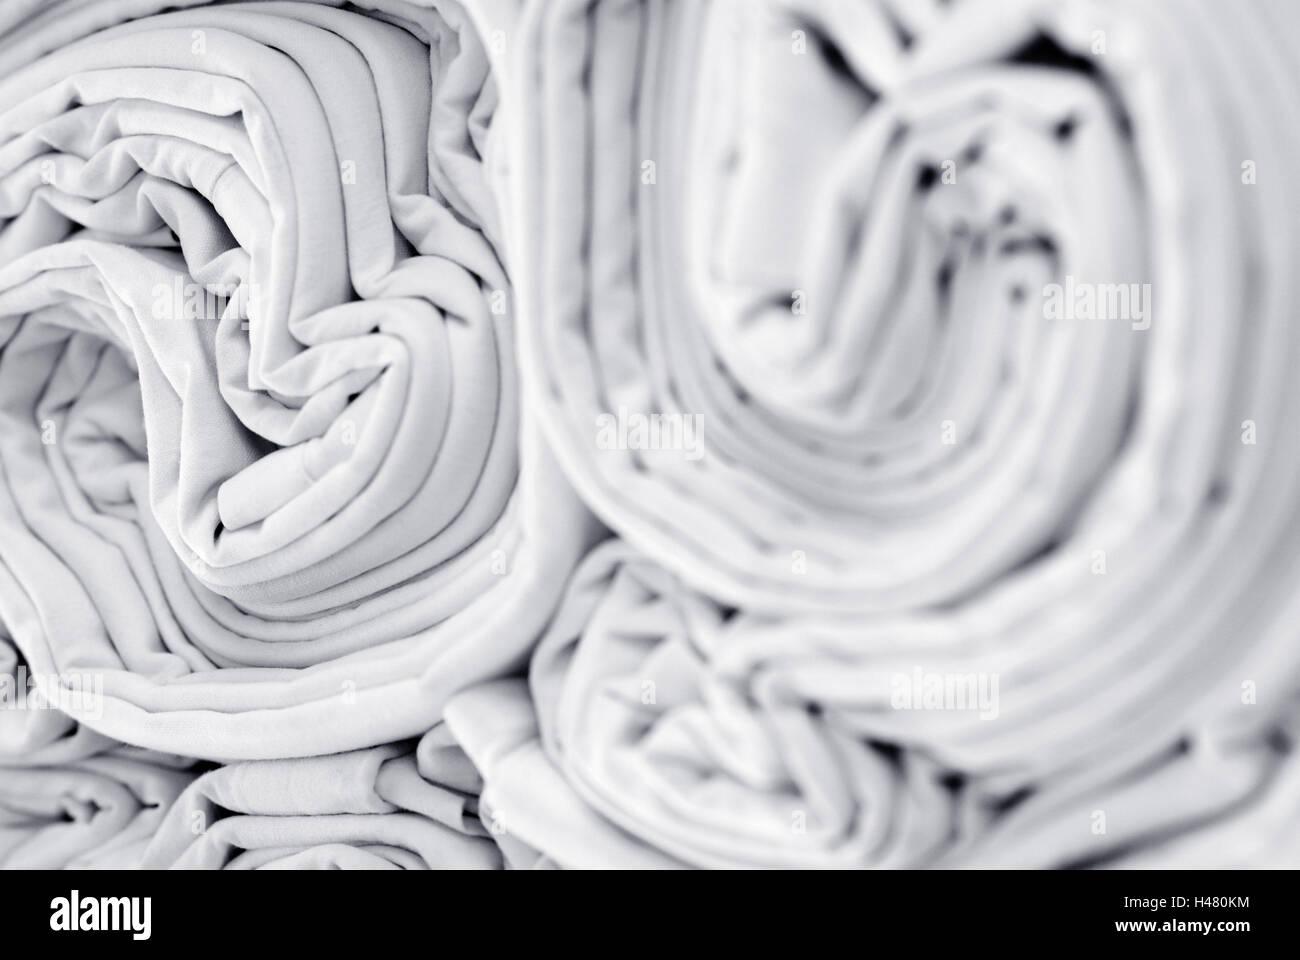 Laundry, bedclothes, substance, folds, white, - Stock Image